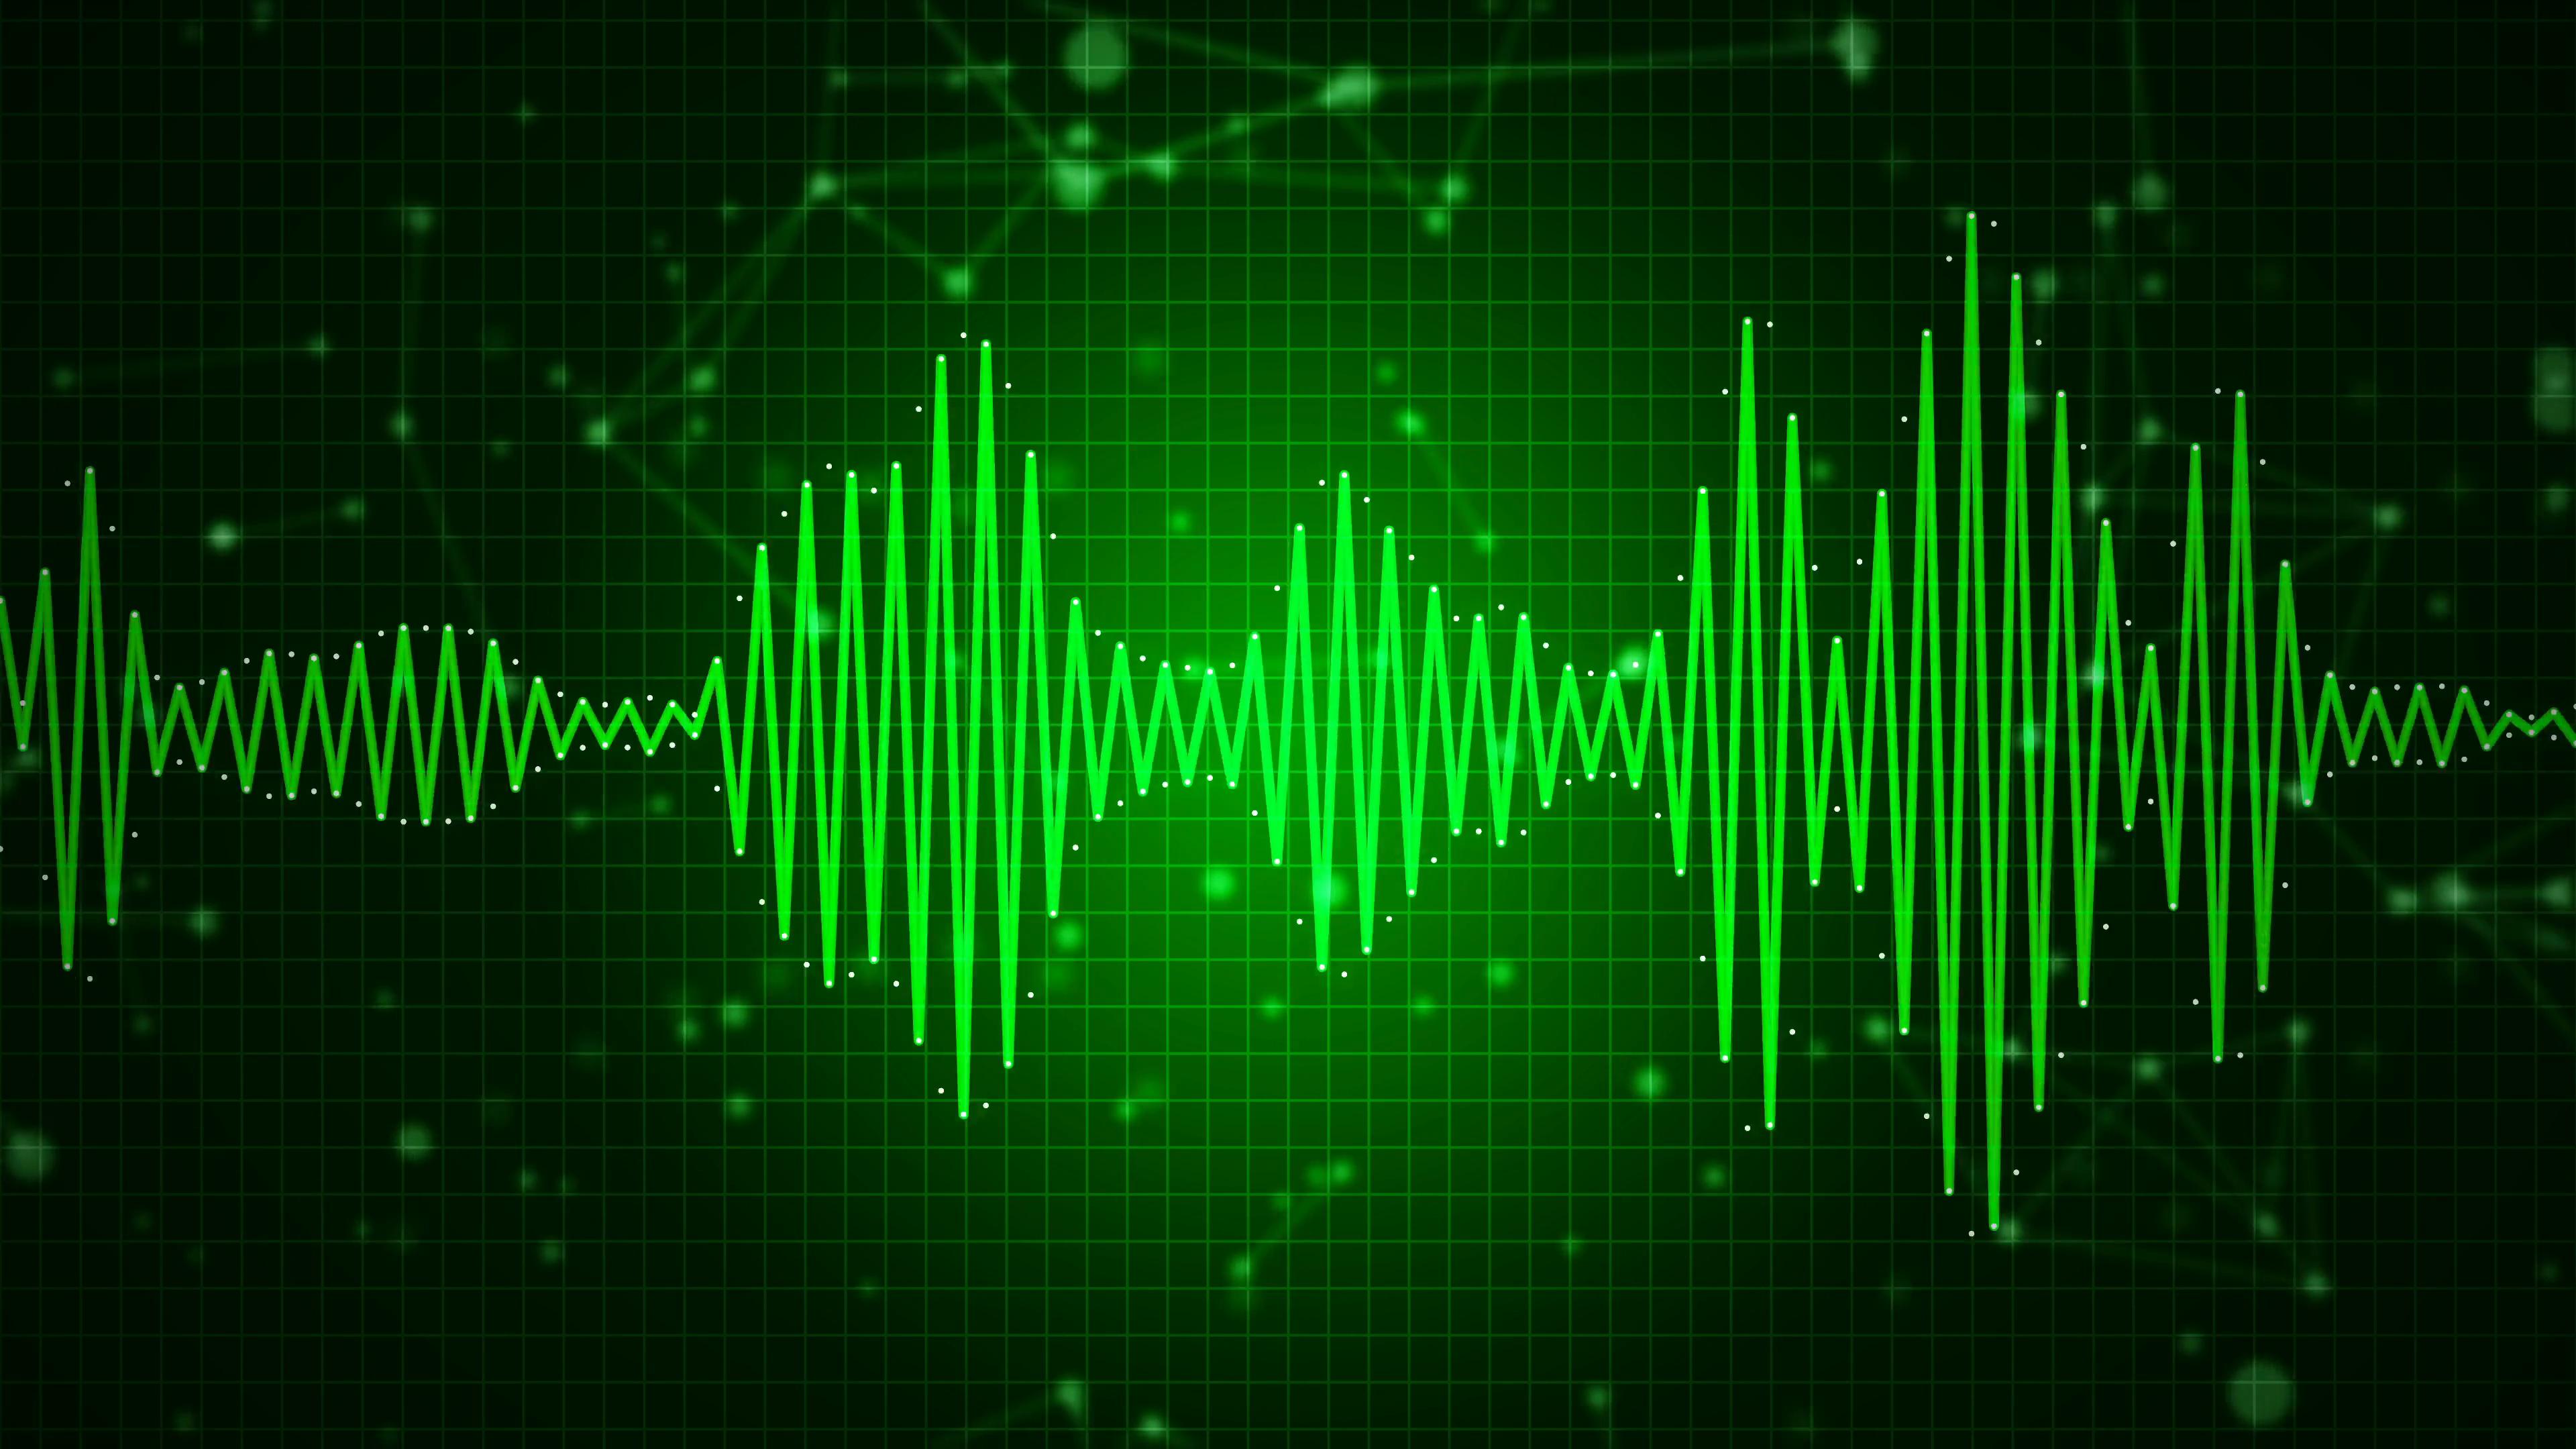 Animated Audio Sound Waveform Spectrum Sound Waves On Green Meninas Comic Art Meninas